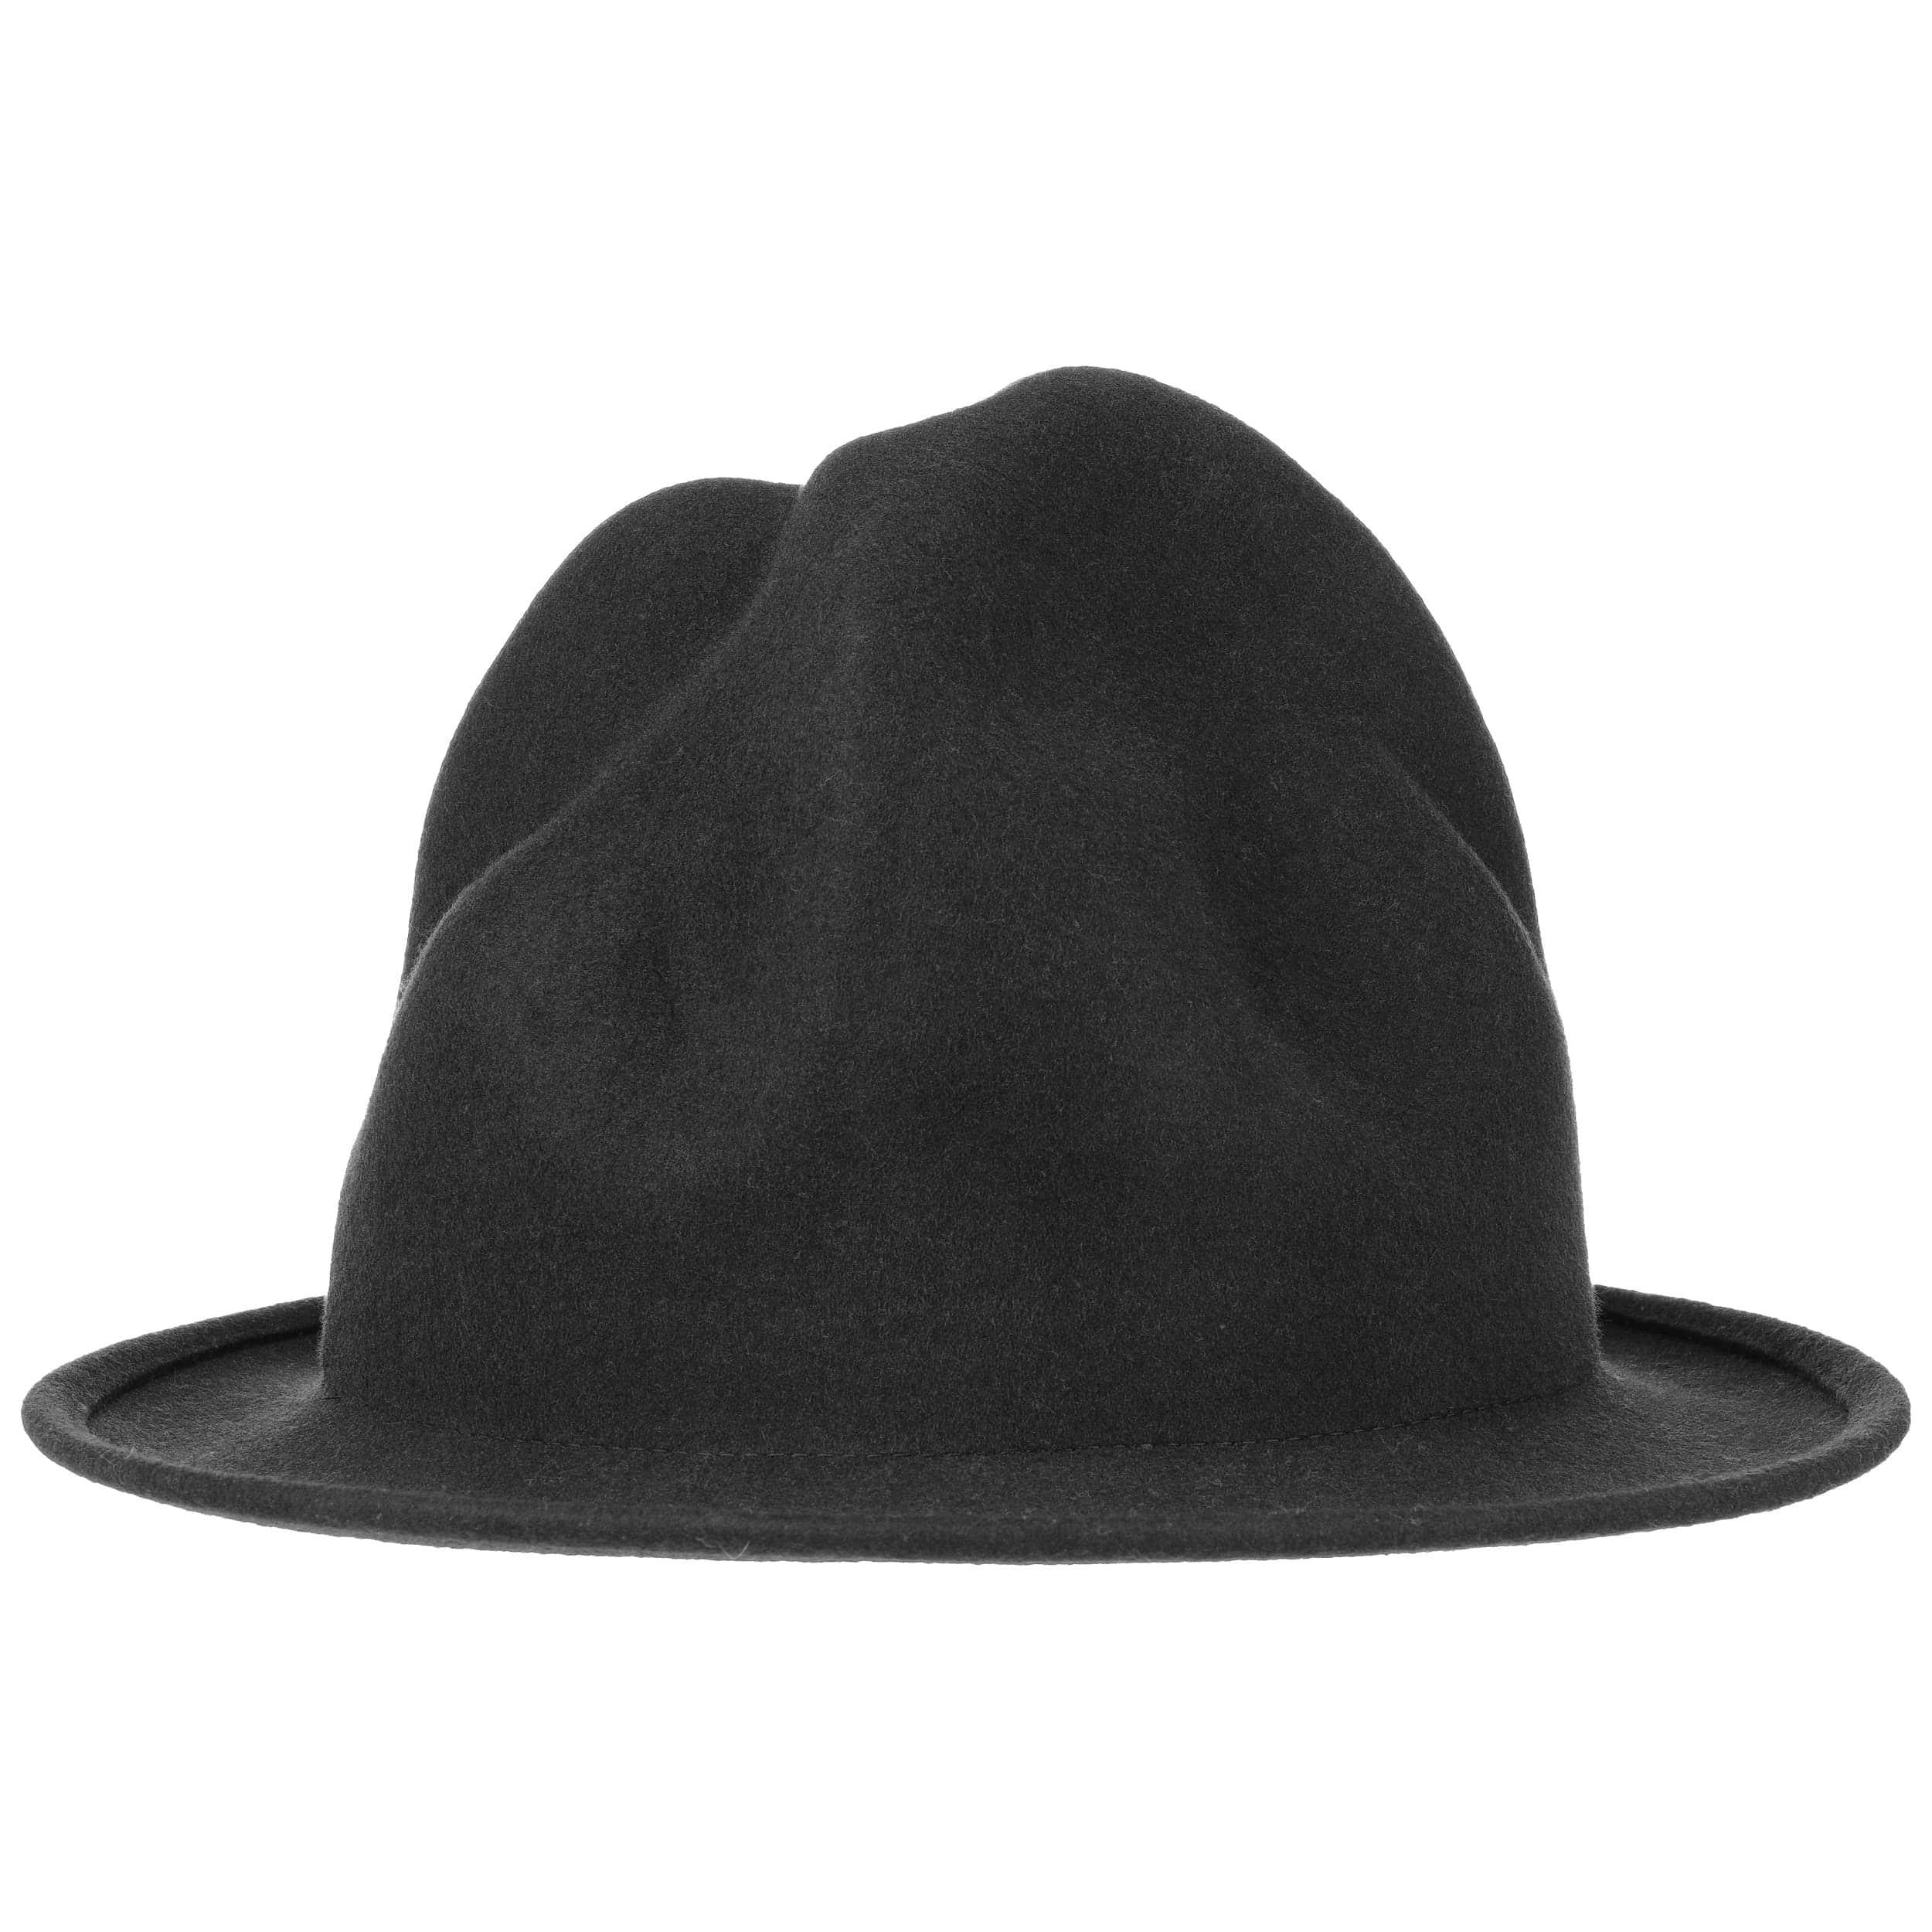 ... Cappello di Feltro Big Mountie by Lierys - nero 4 103a2cb8c2b5